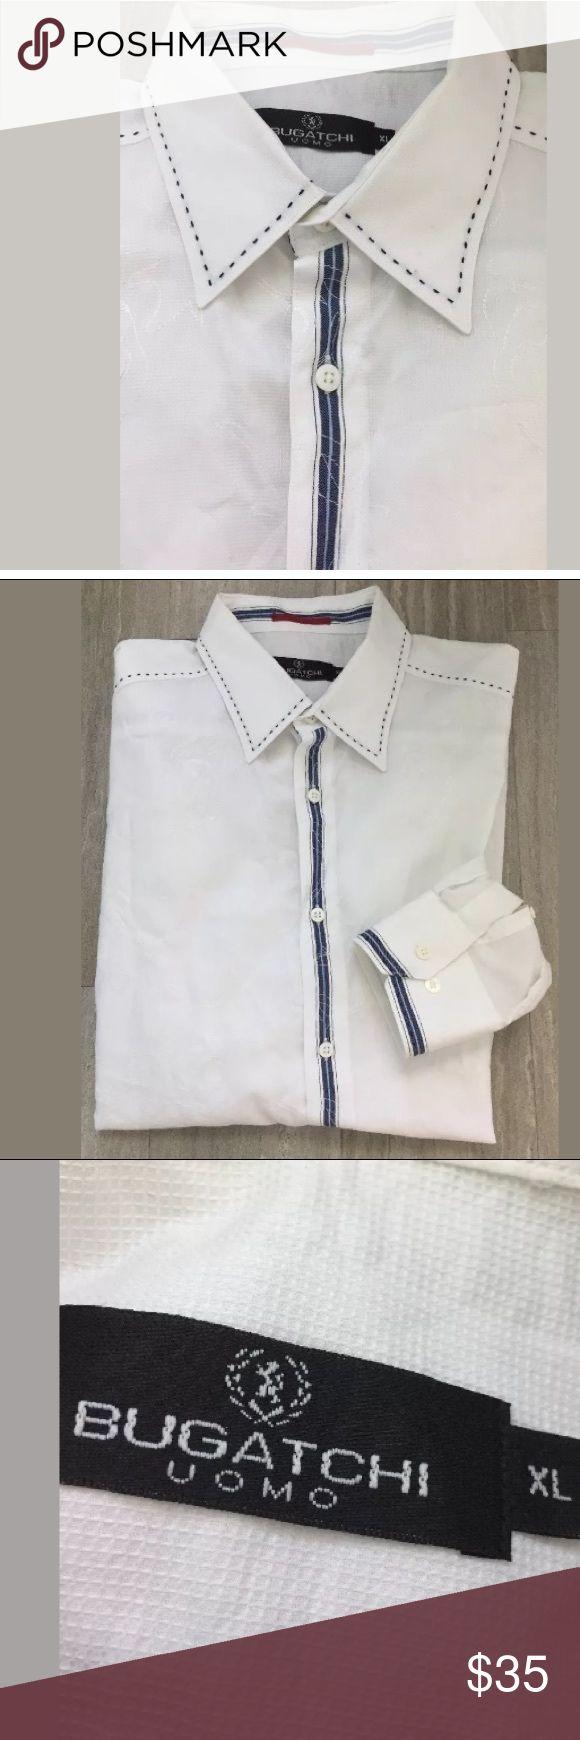 Bugatchi Uomo Xl shirt See last pic for description Bugatchi Shirts Dress Shirts